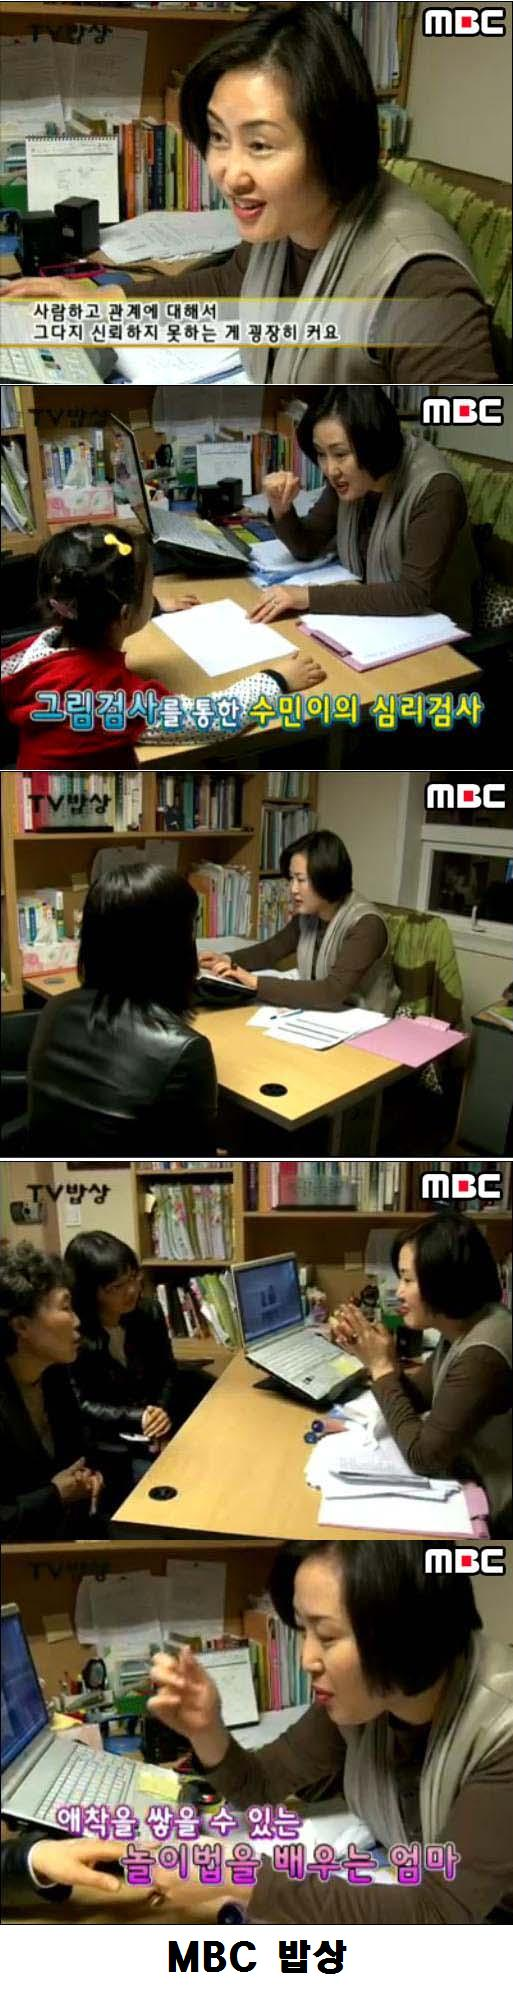 MBC 밥상.jpg